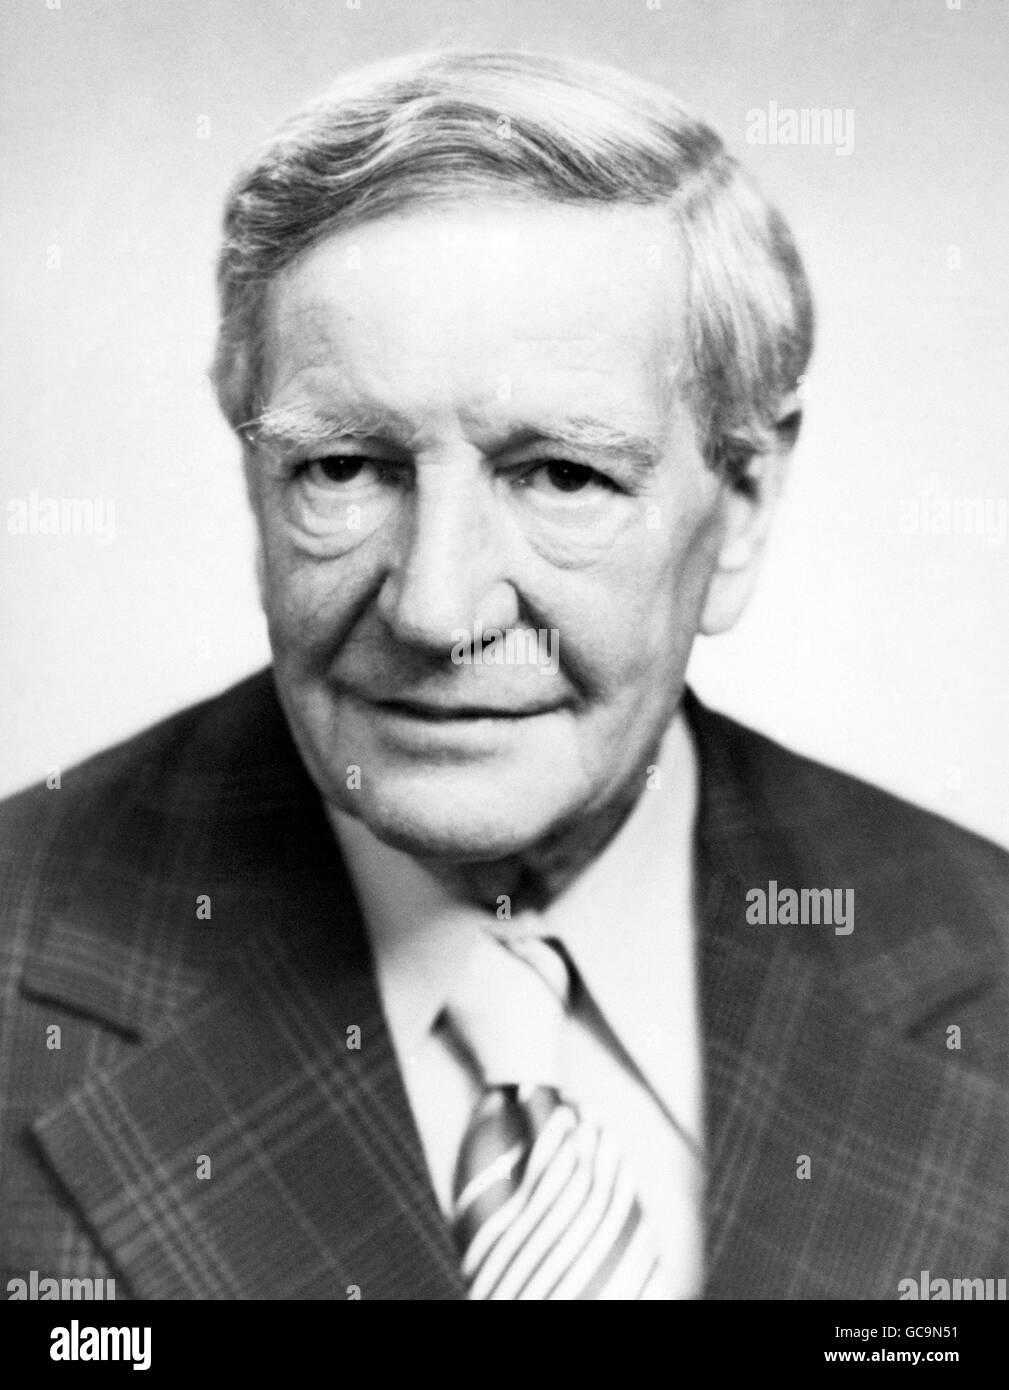 MASTERSPY KIM PHILBY - AUCTION - Stock Image